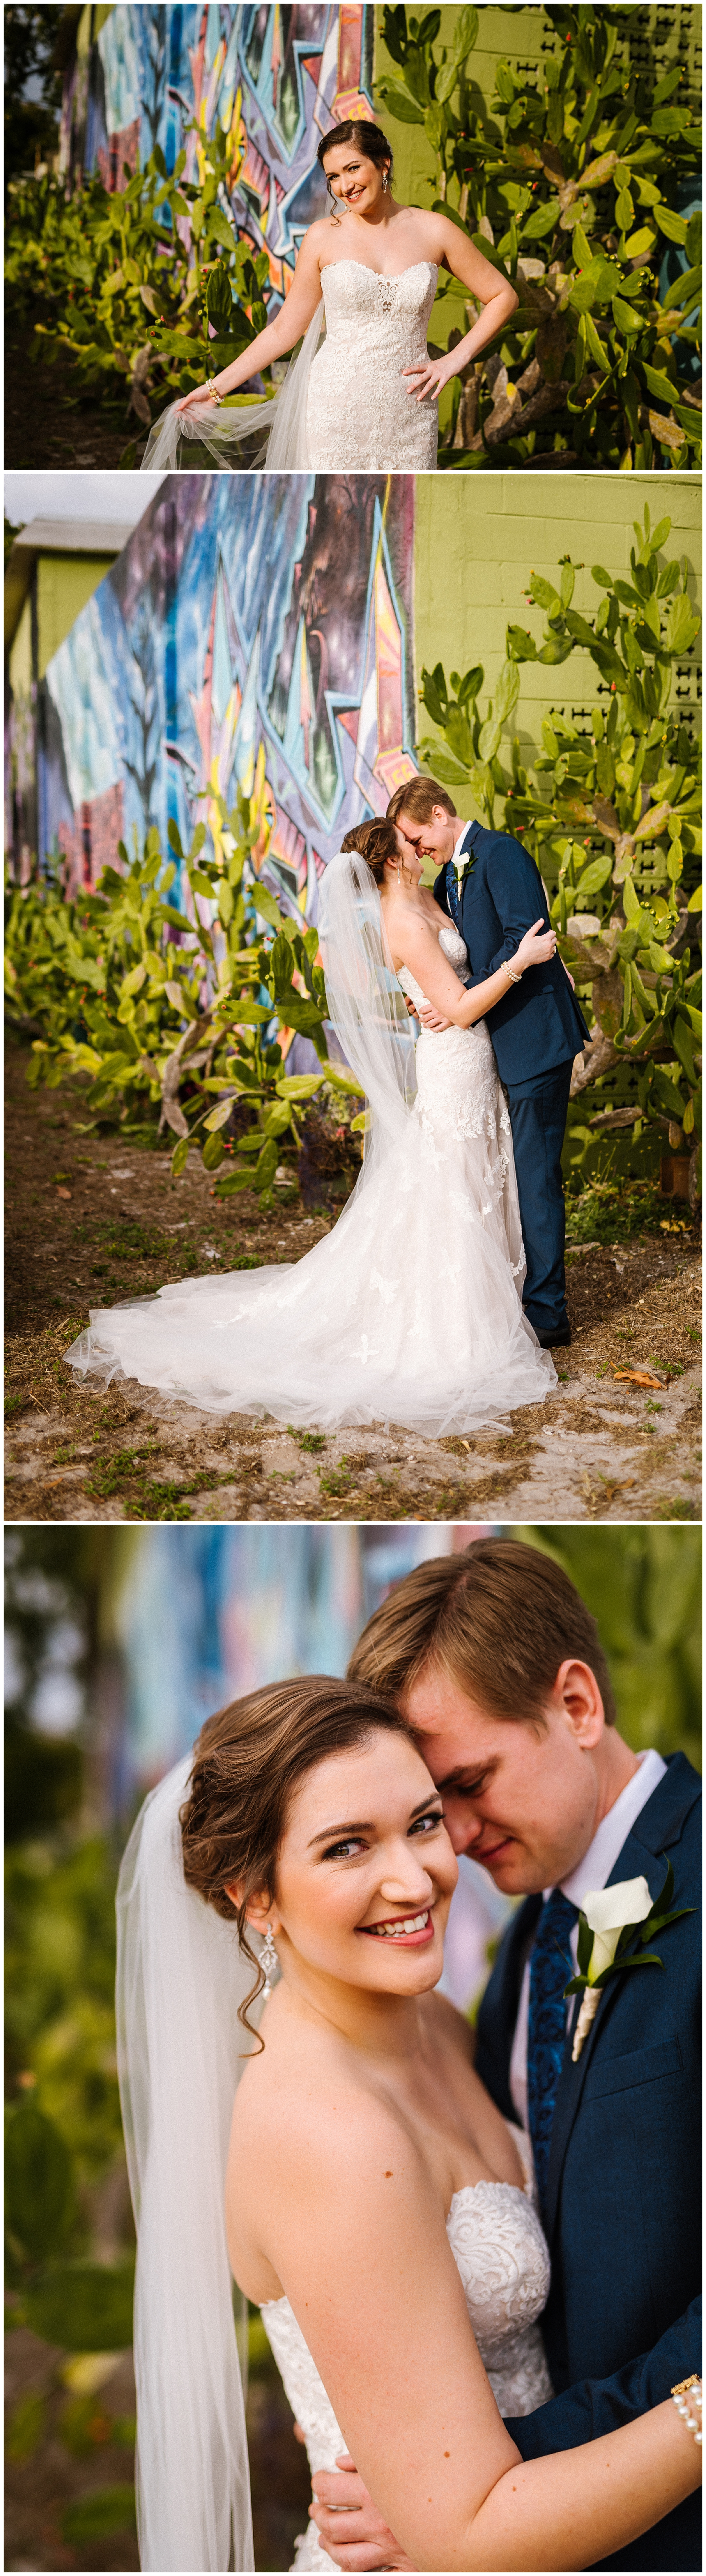 St-pete-wedding-photography-unique-glass-blowing-gallery-succulent-art_0016.jpg